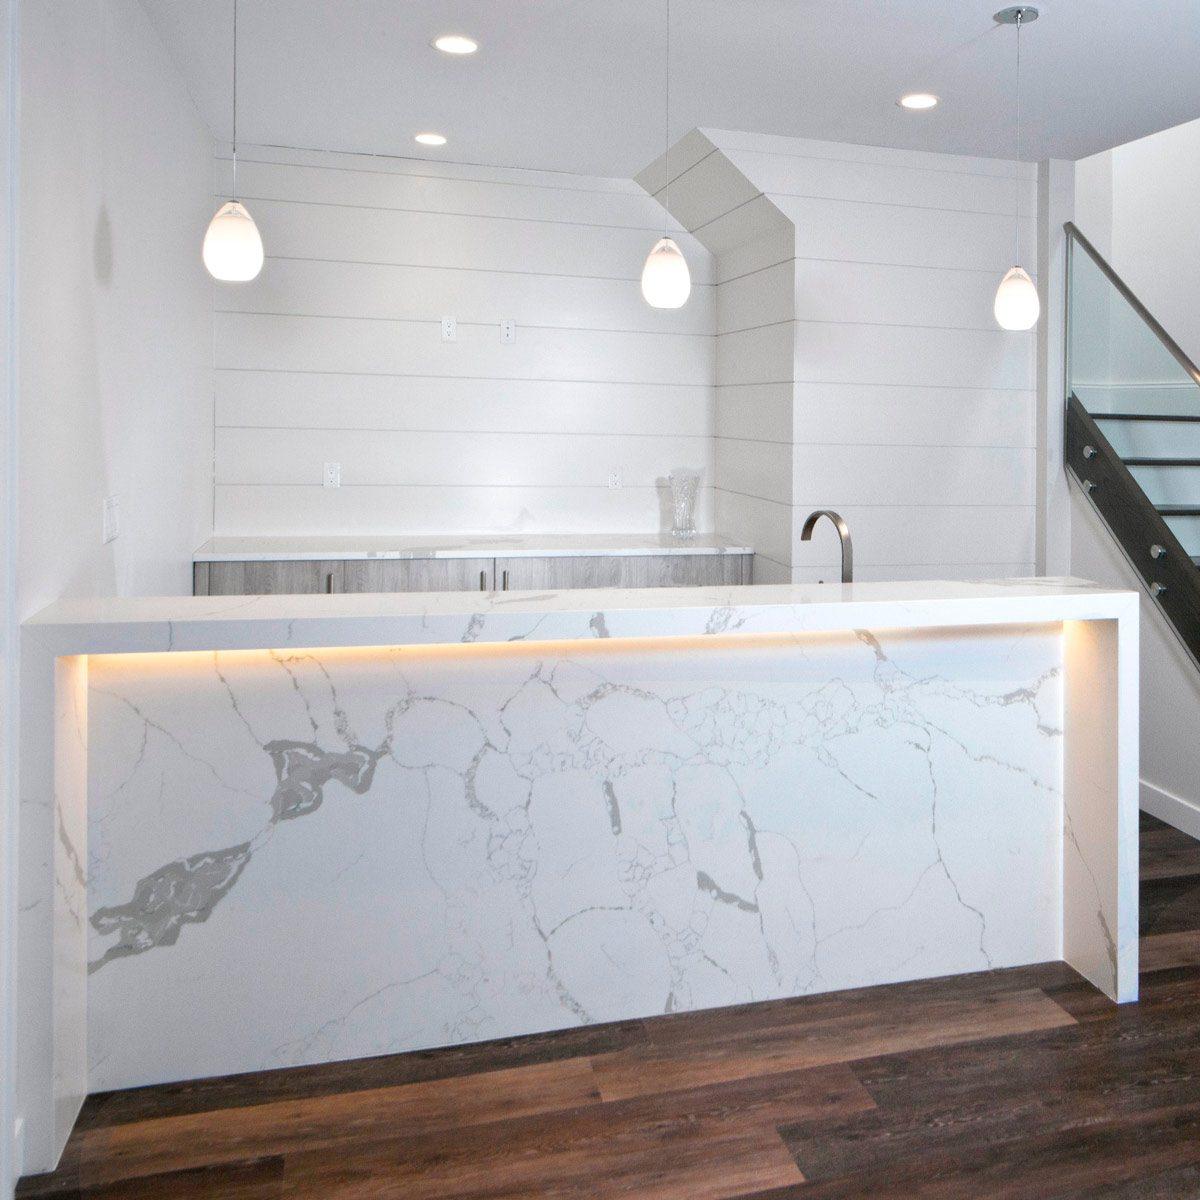 Big White Shower Tile Ideas